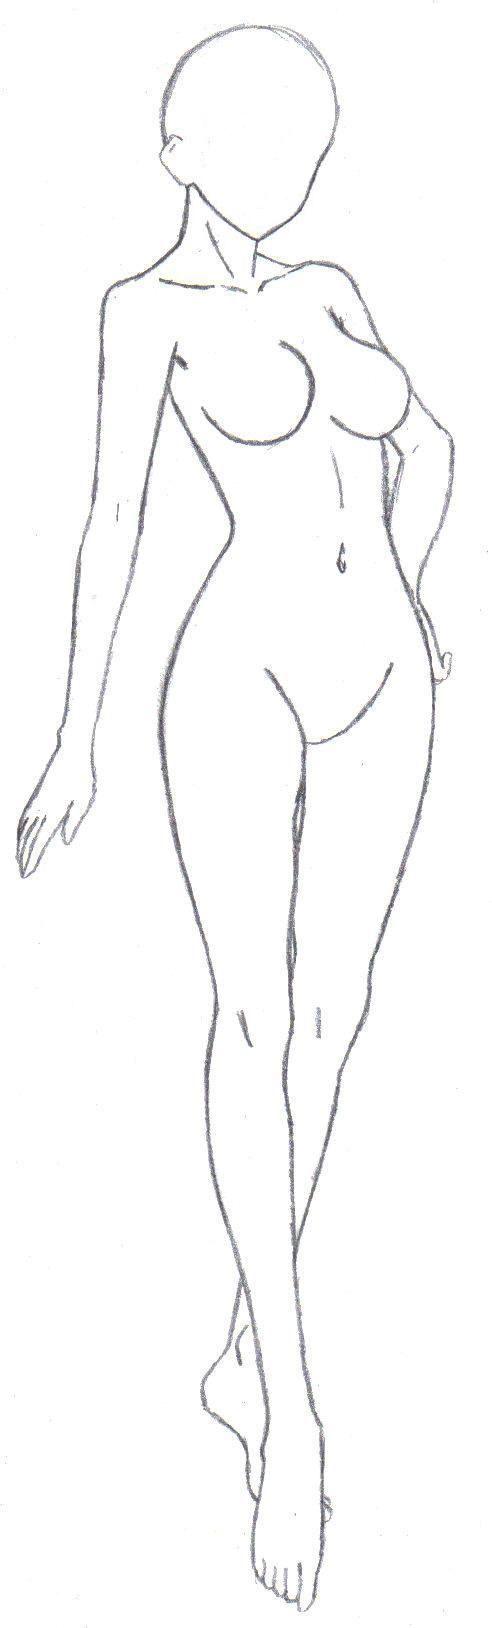 Body Frame 2 by Beta-Type-Jakuri.deviantart.com on @deviantART